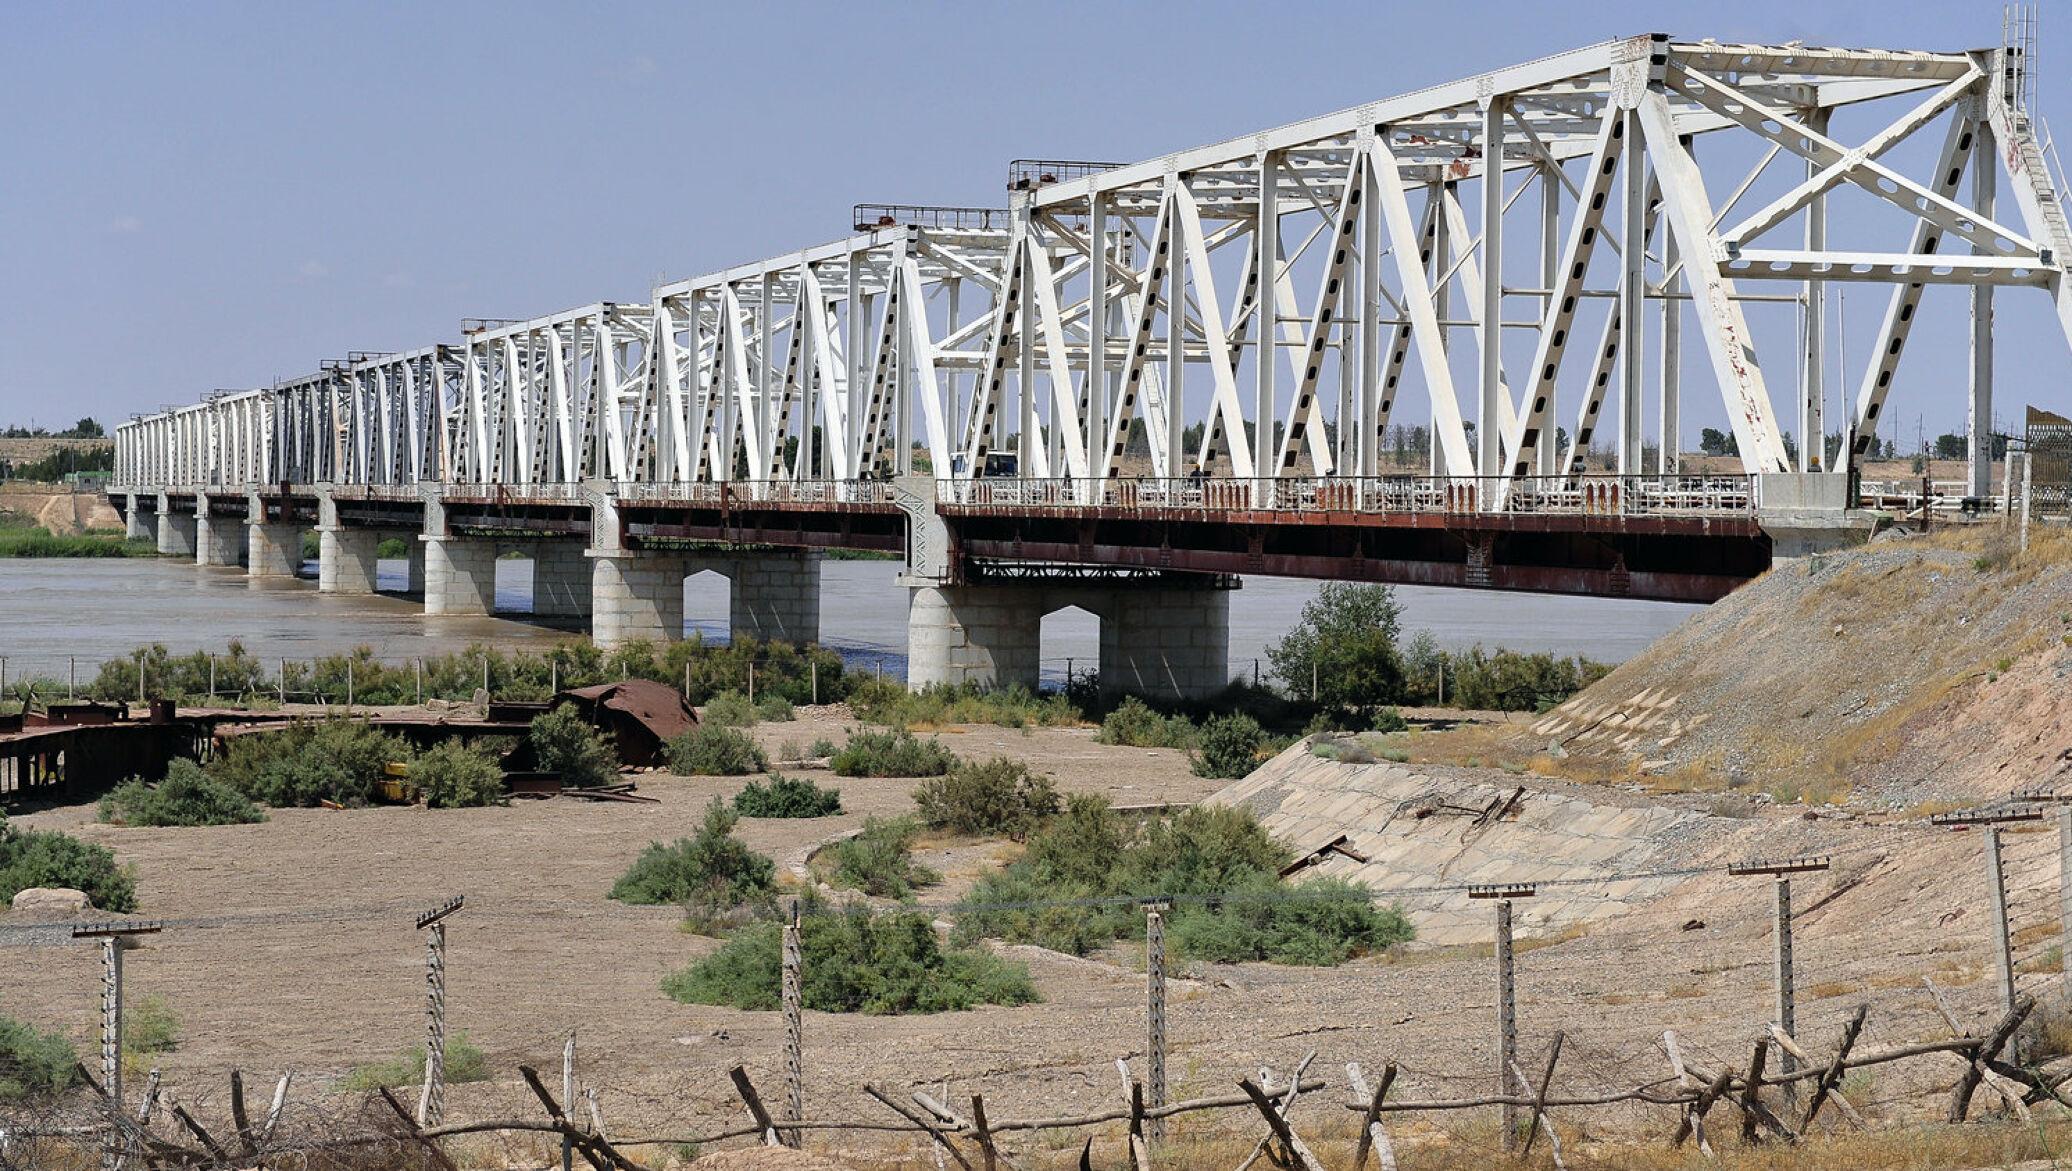 Незаконно пересекшие границу афганцы покинули Узбекистан